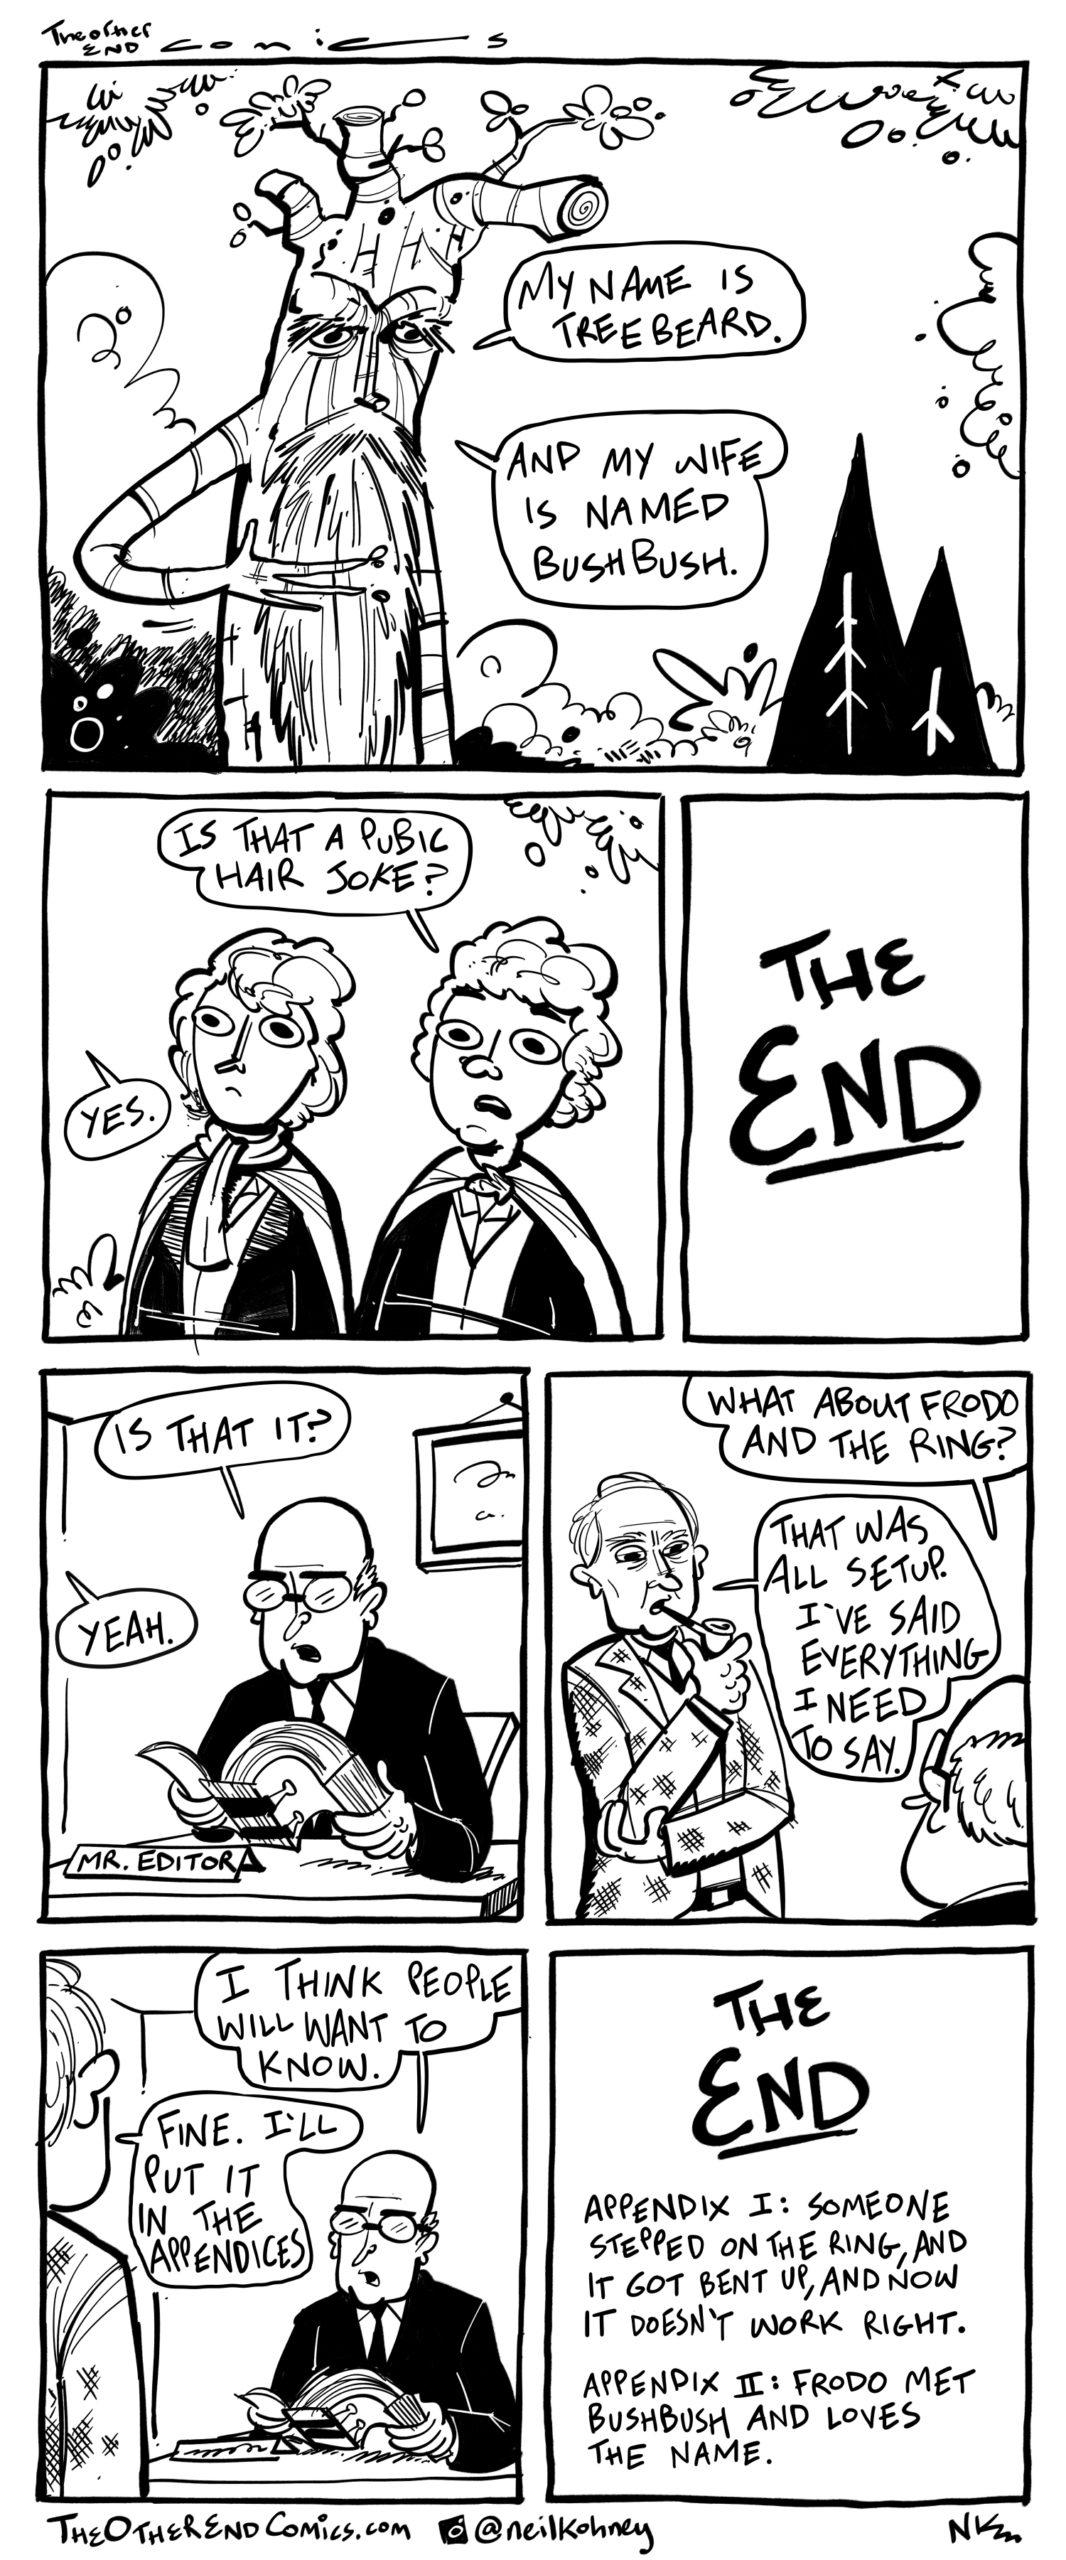 Fun fact: JRR Tolkien's full name is Junior Randy Tolkien